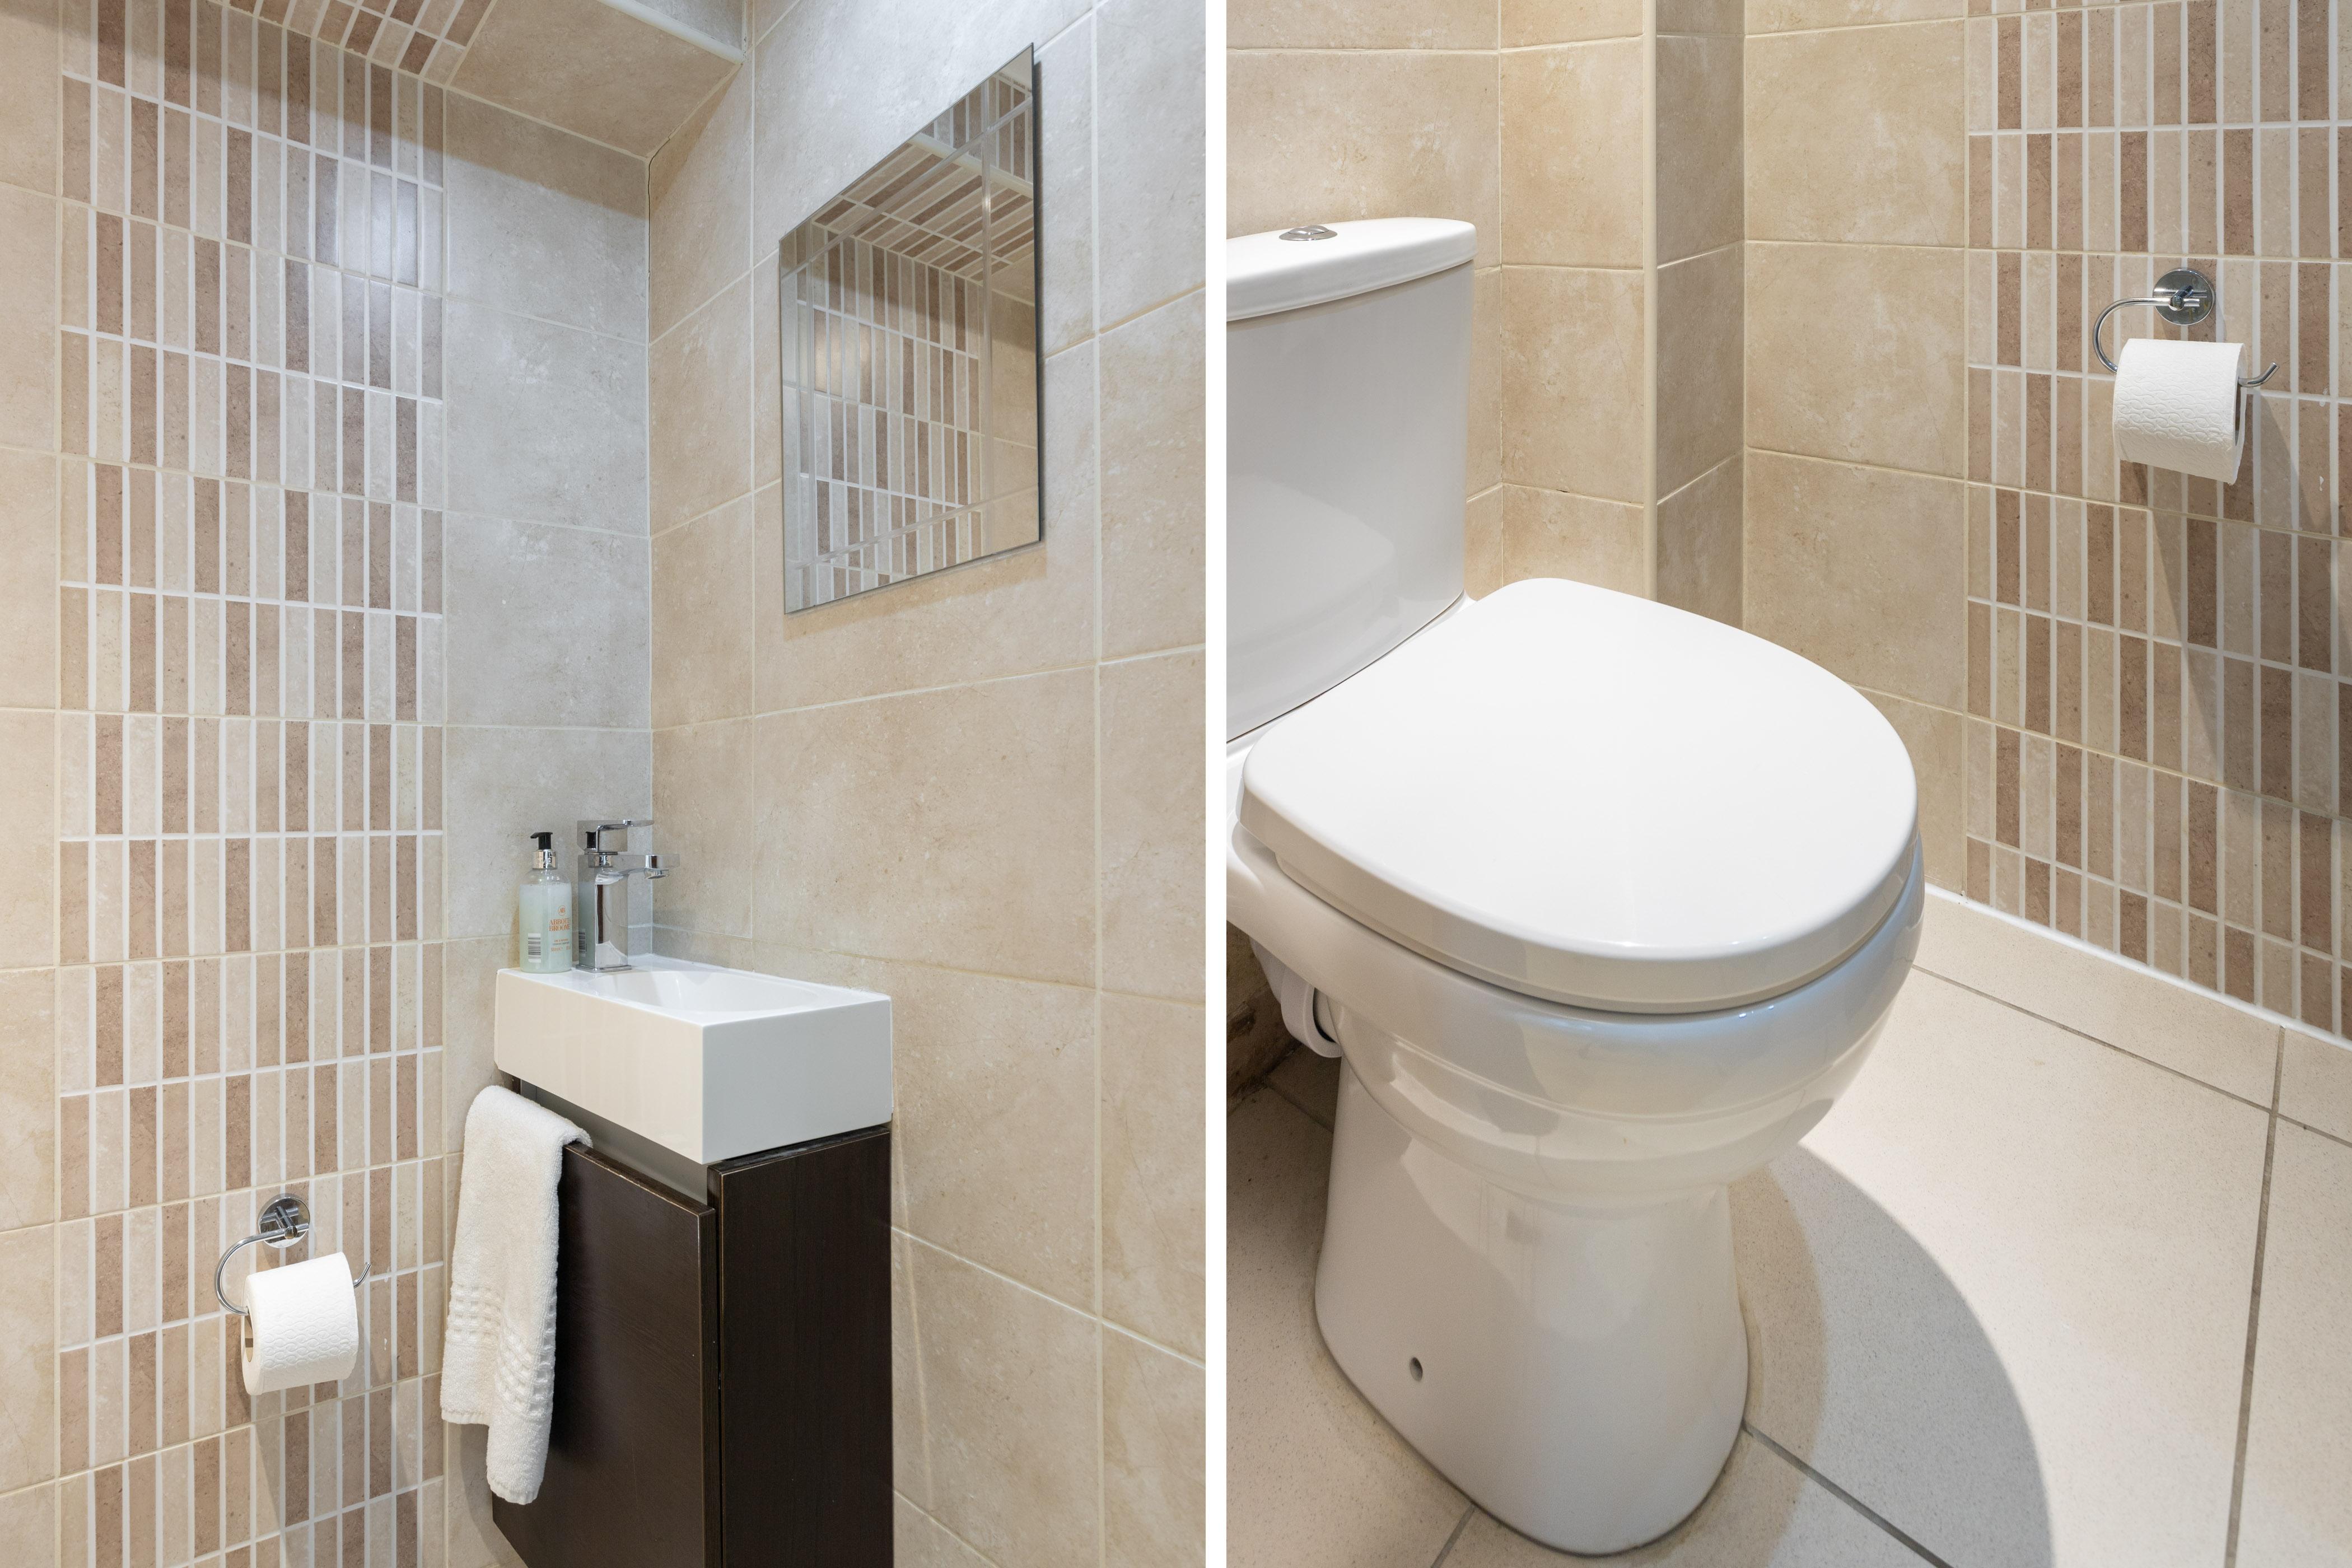 Apartment King s Cross Eurostar Double Room - Shared Bathroom - Shared Kitchen  ROOM 4  photo 26059386